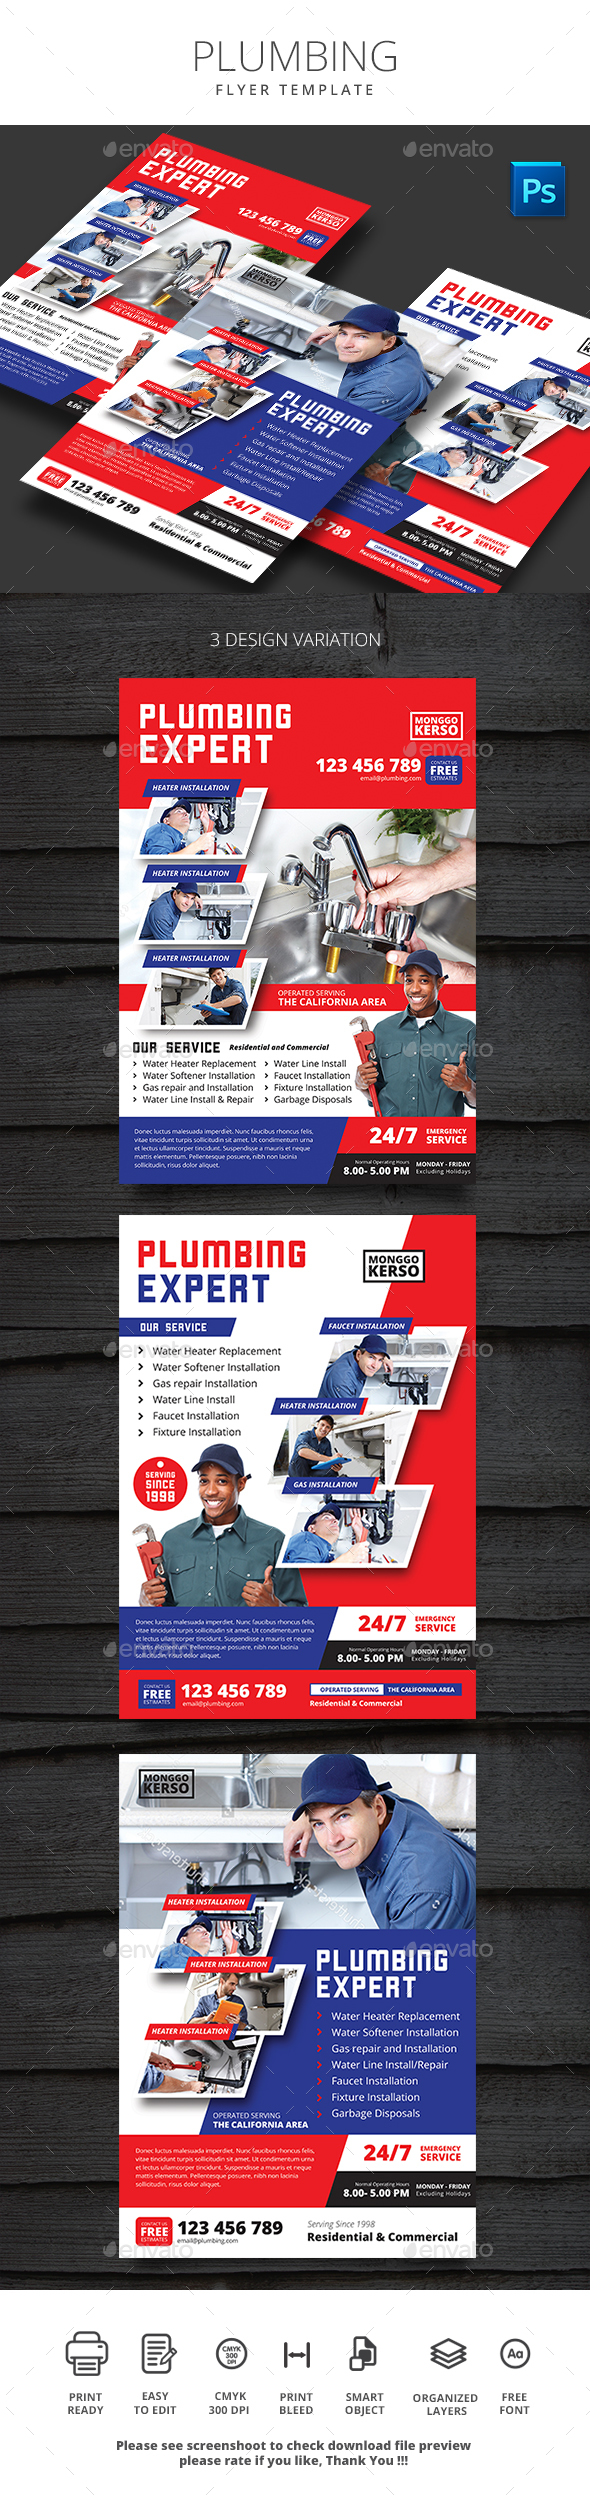 Plumbing - Print Templates